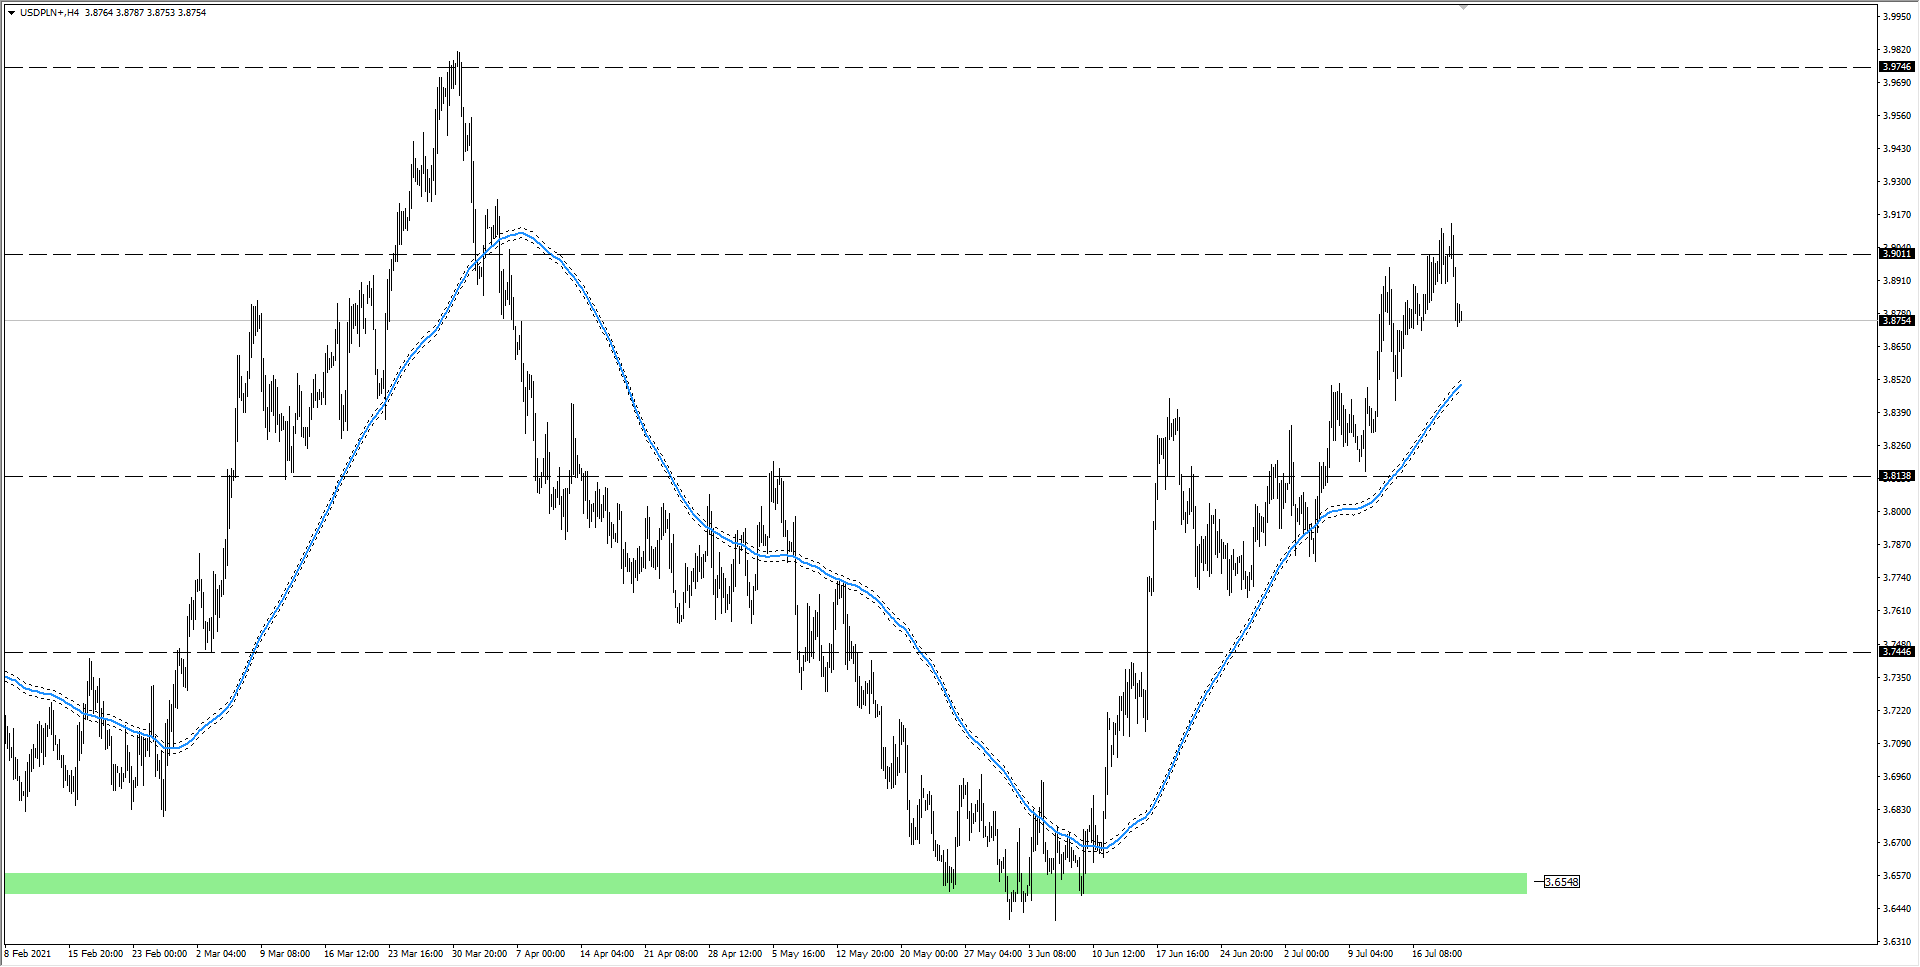 wykres Kurs dolara USDPLN H4 22.07.2021